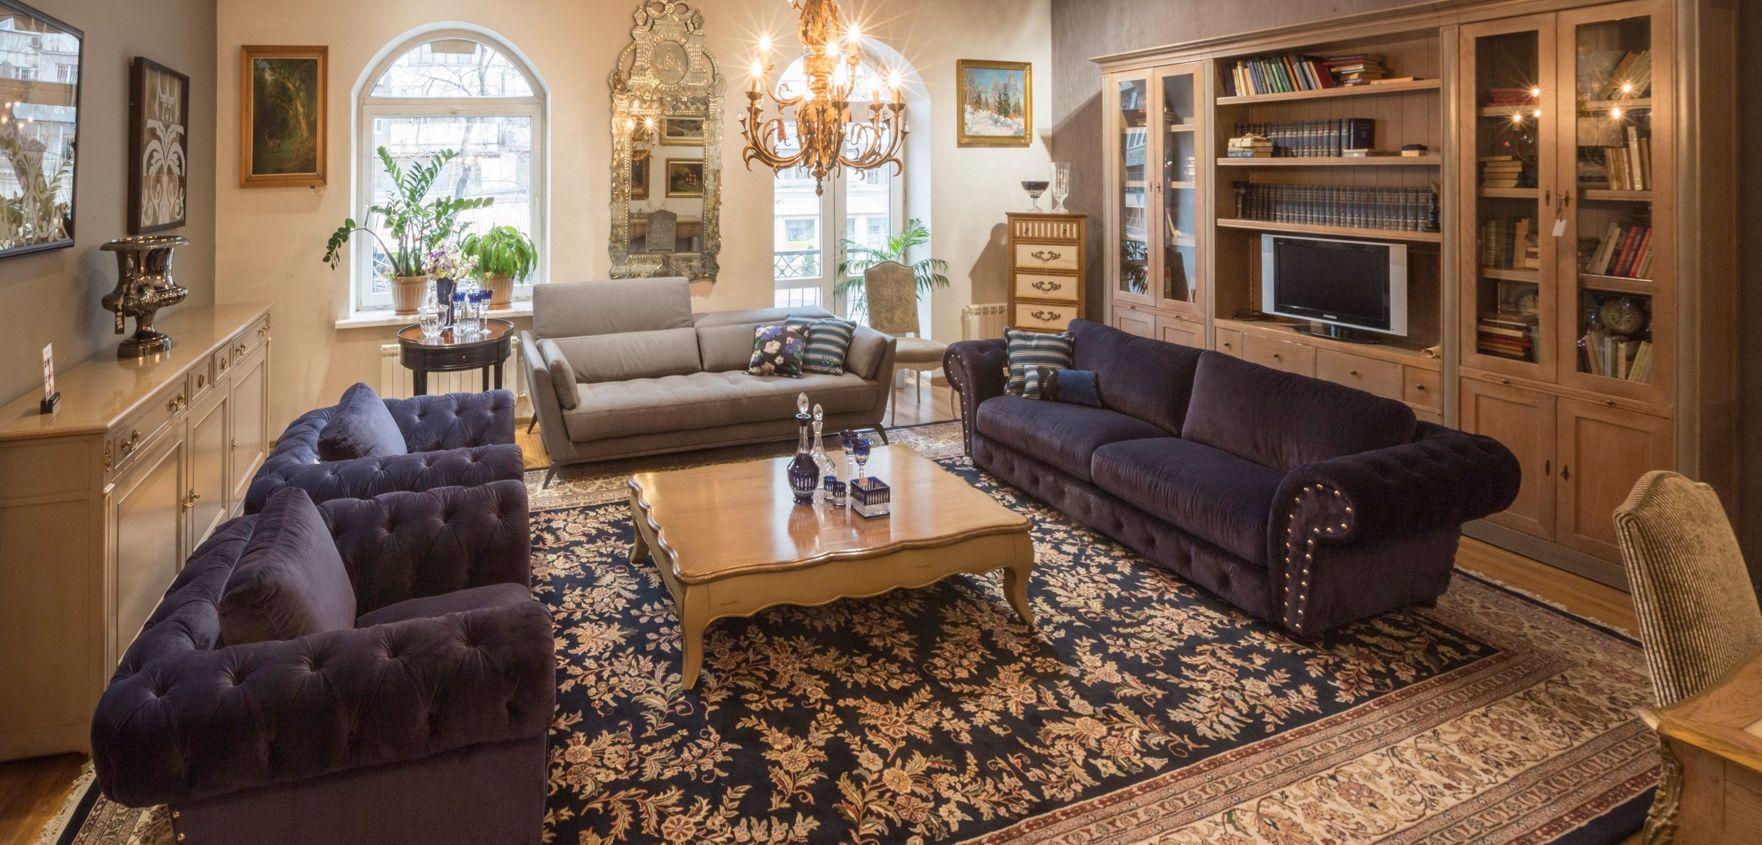 rendez vous magasin roche bobois almaty 50010. Black Bedroom Furniture Sets. Home Design Ideas